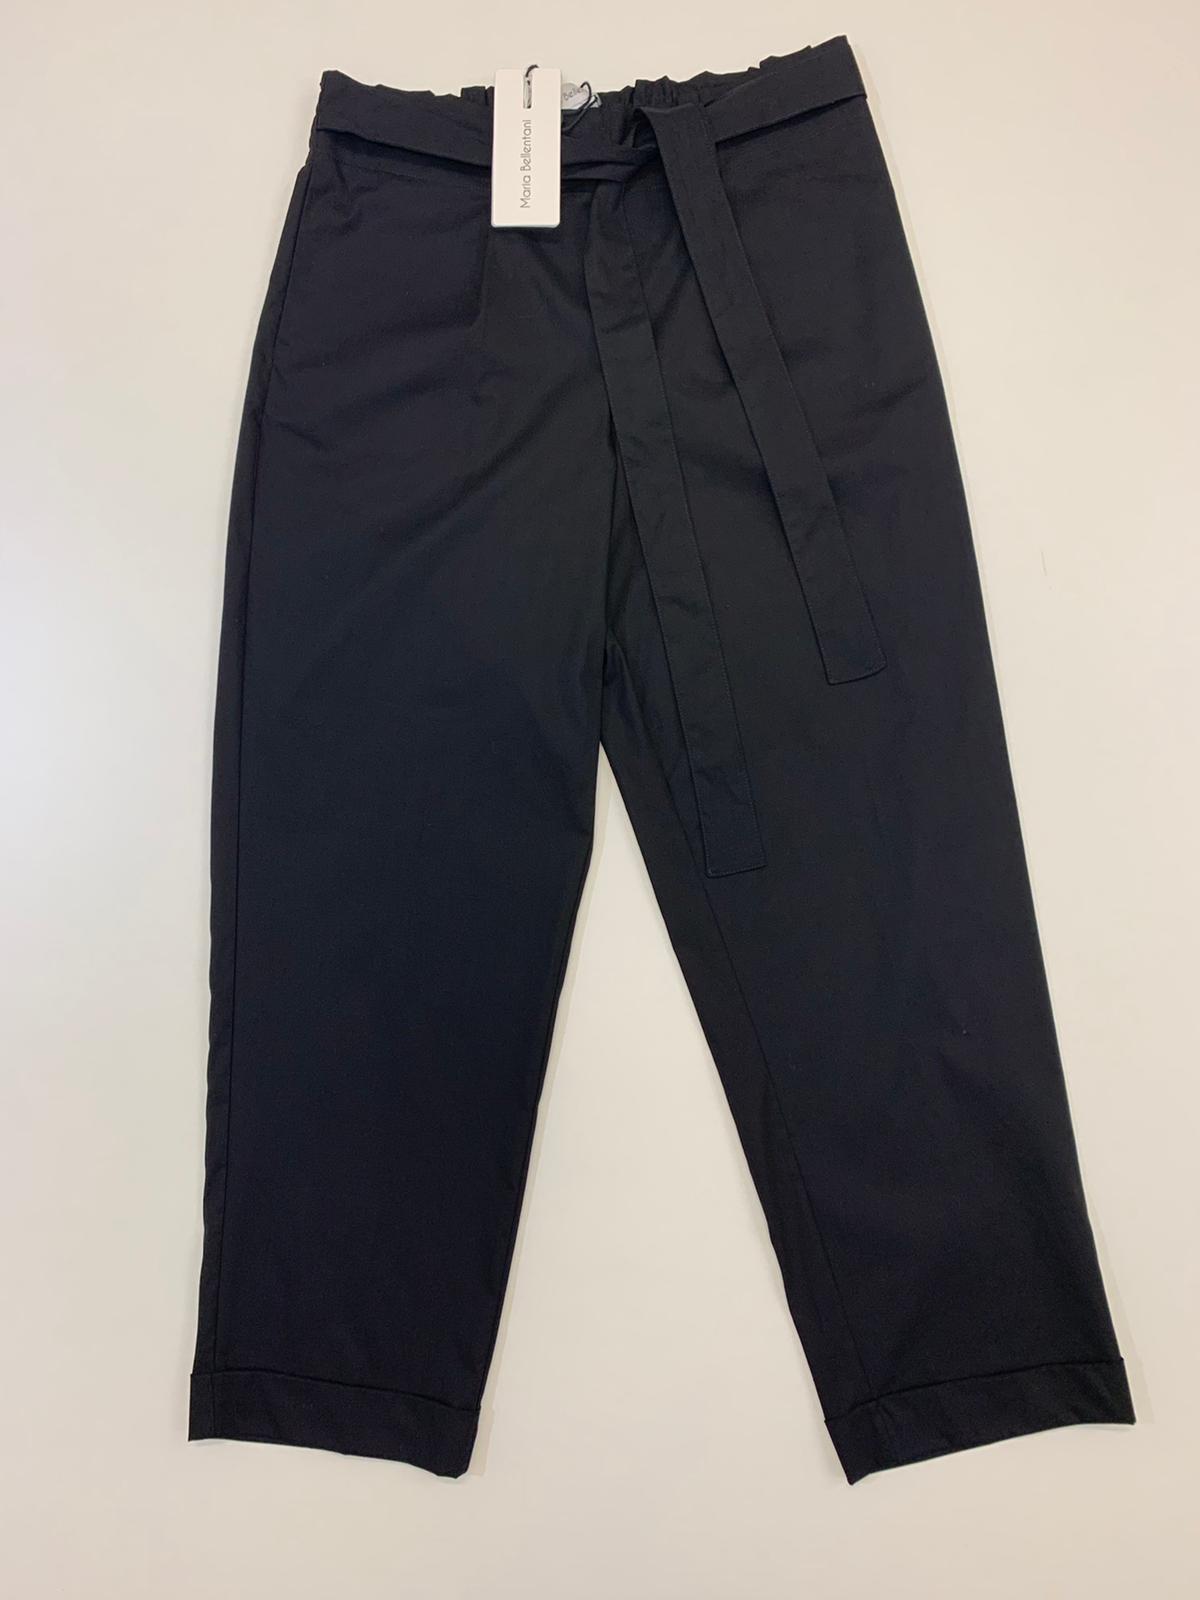 Pantalone Maria Bellentani Cropped Nero